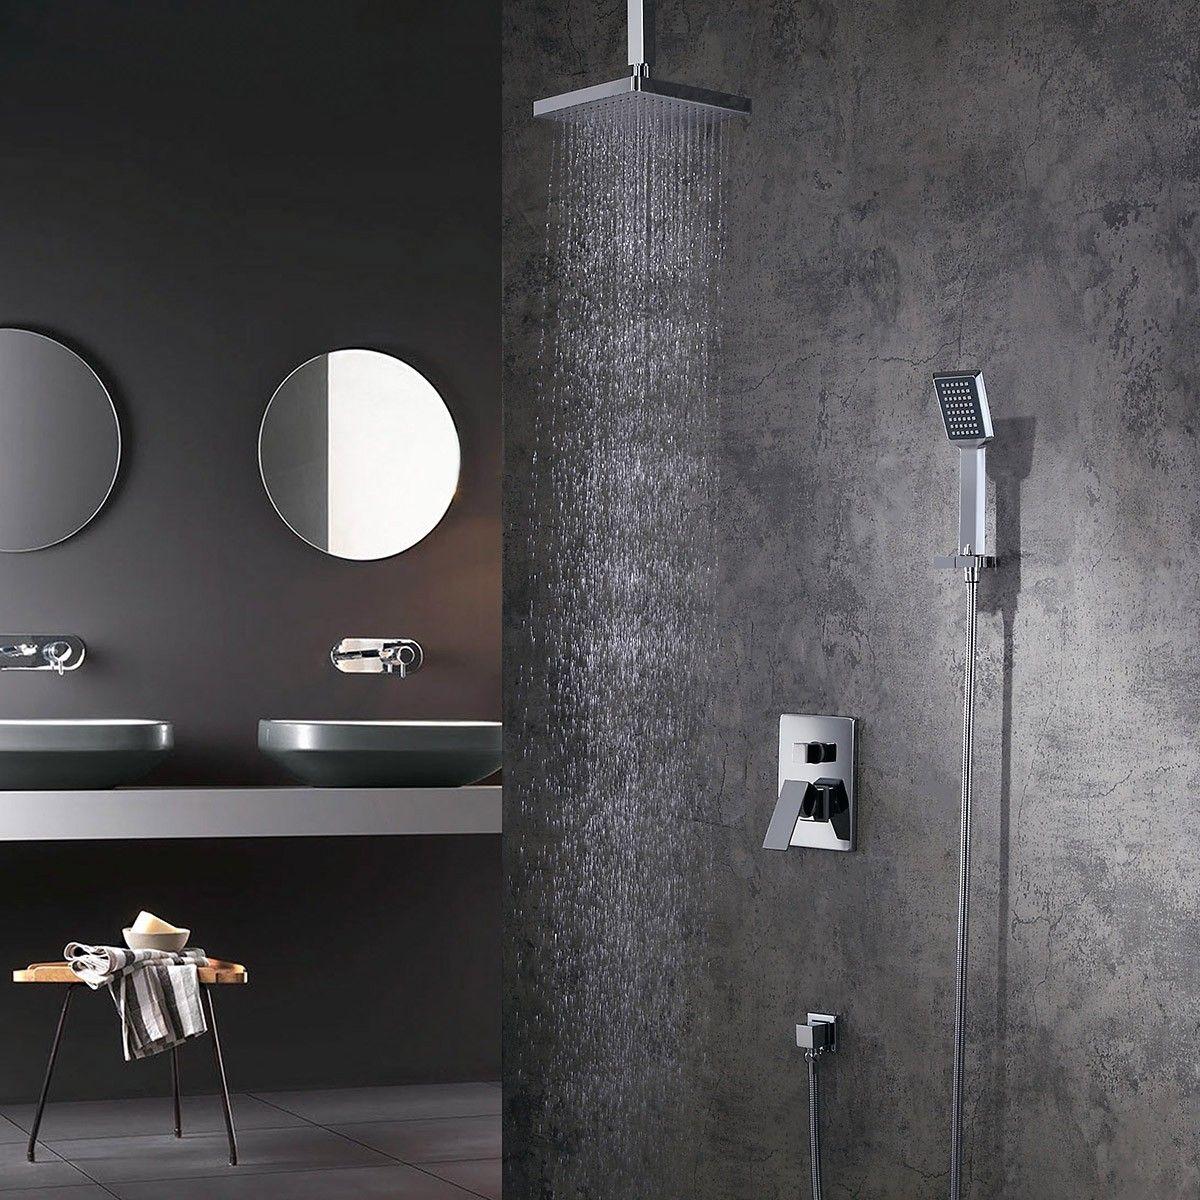 Dree Modern Abs Ceiling Mounted Rain Shower Head Hand Shower Set Single Handle Brass In Polished Chrome Bathroom Remodel Shower Rain Shower Head Contemporary Bathroom Decor [ 1200 x 1200 Pixel ]